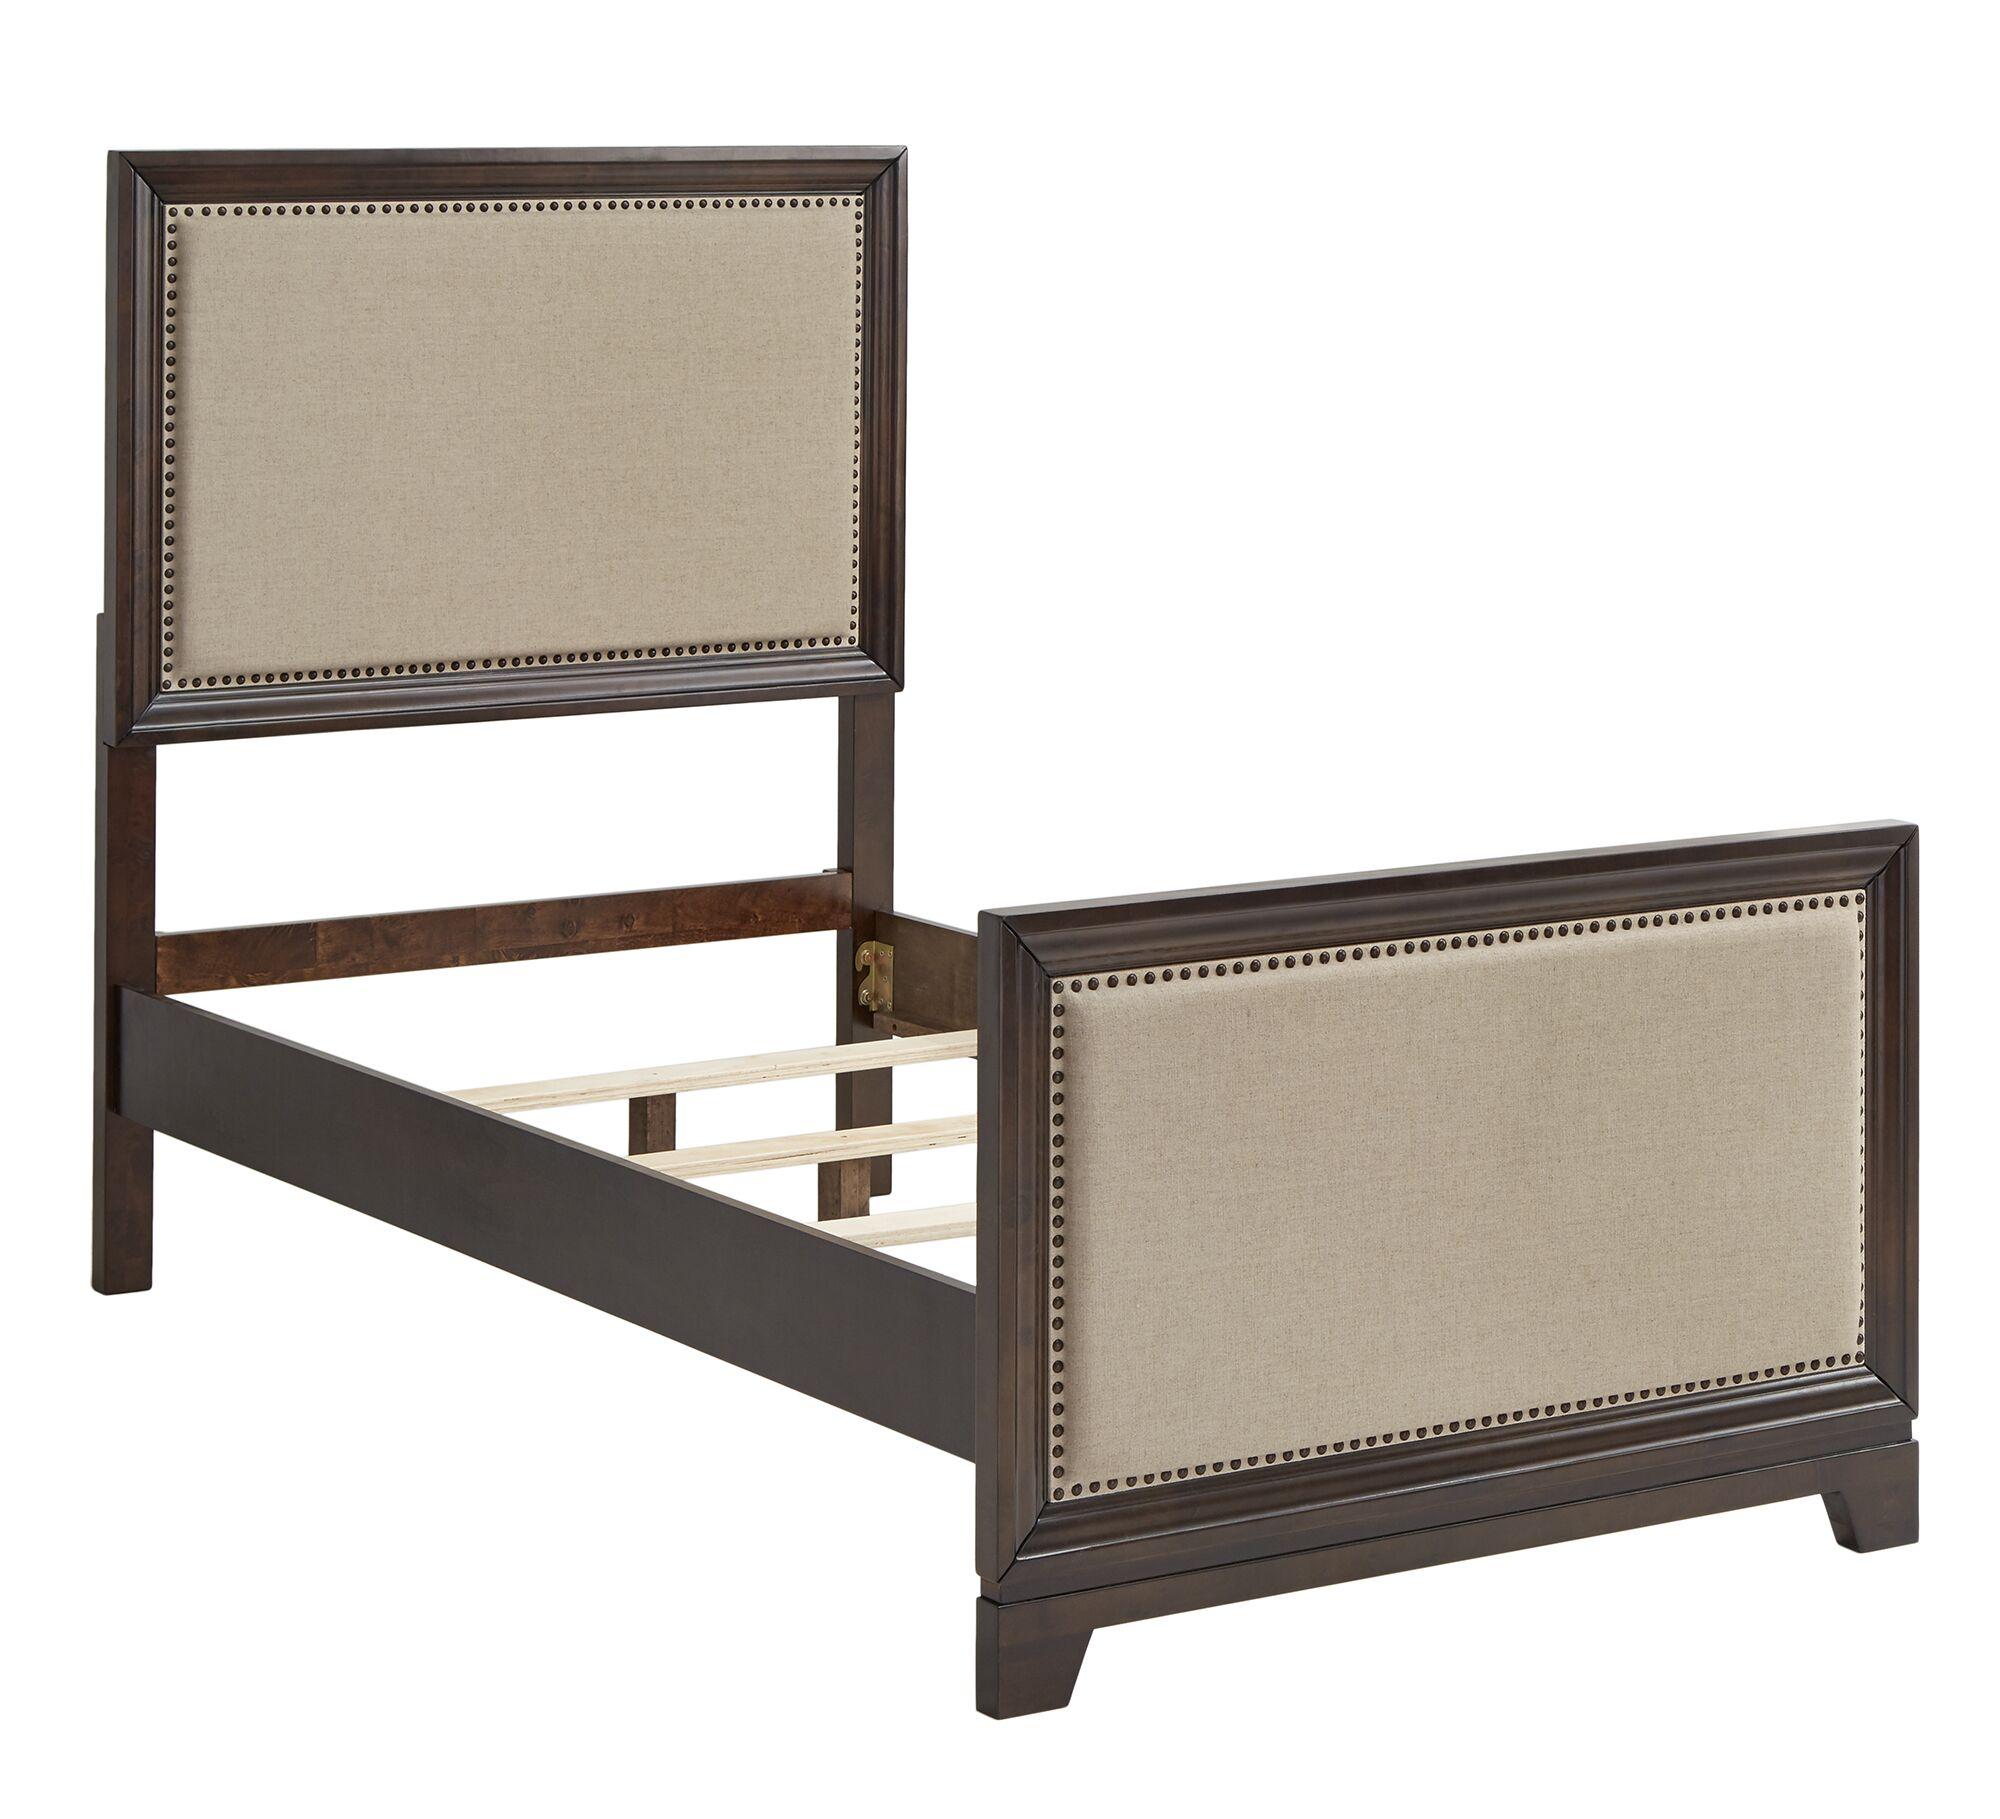 Broseley Upholstered Panel Bed Color: Beige, Size: Queen